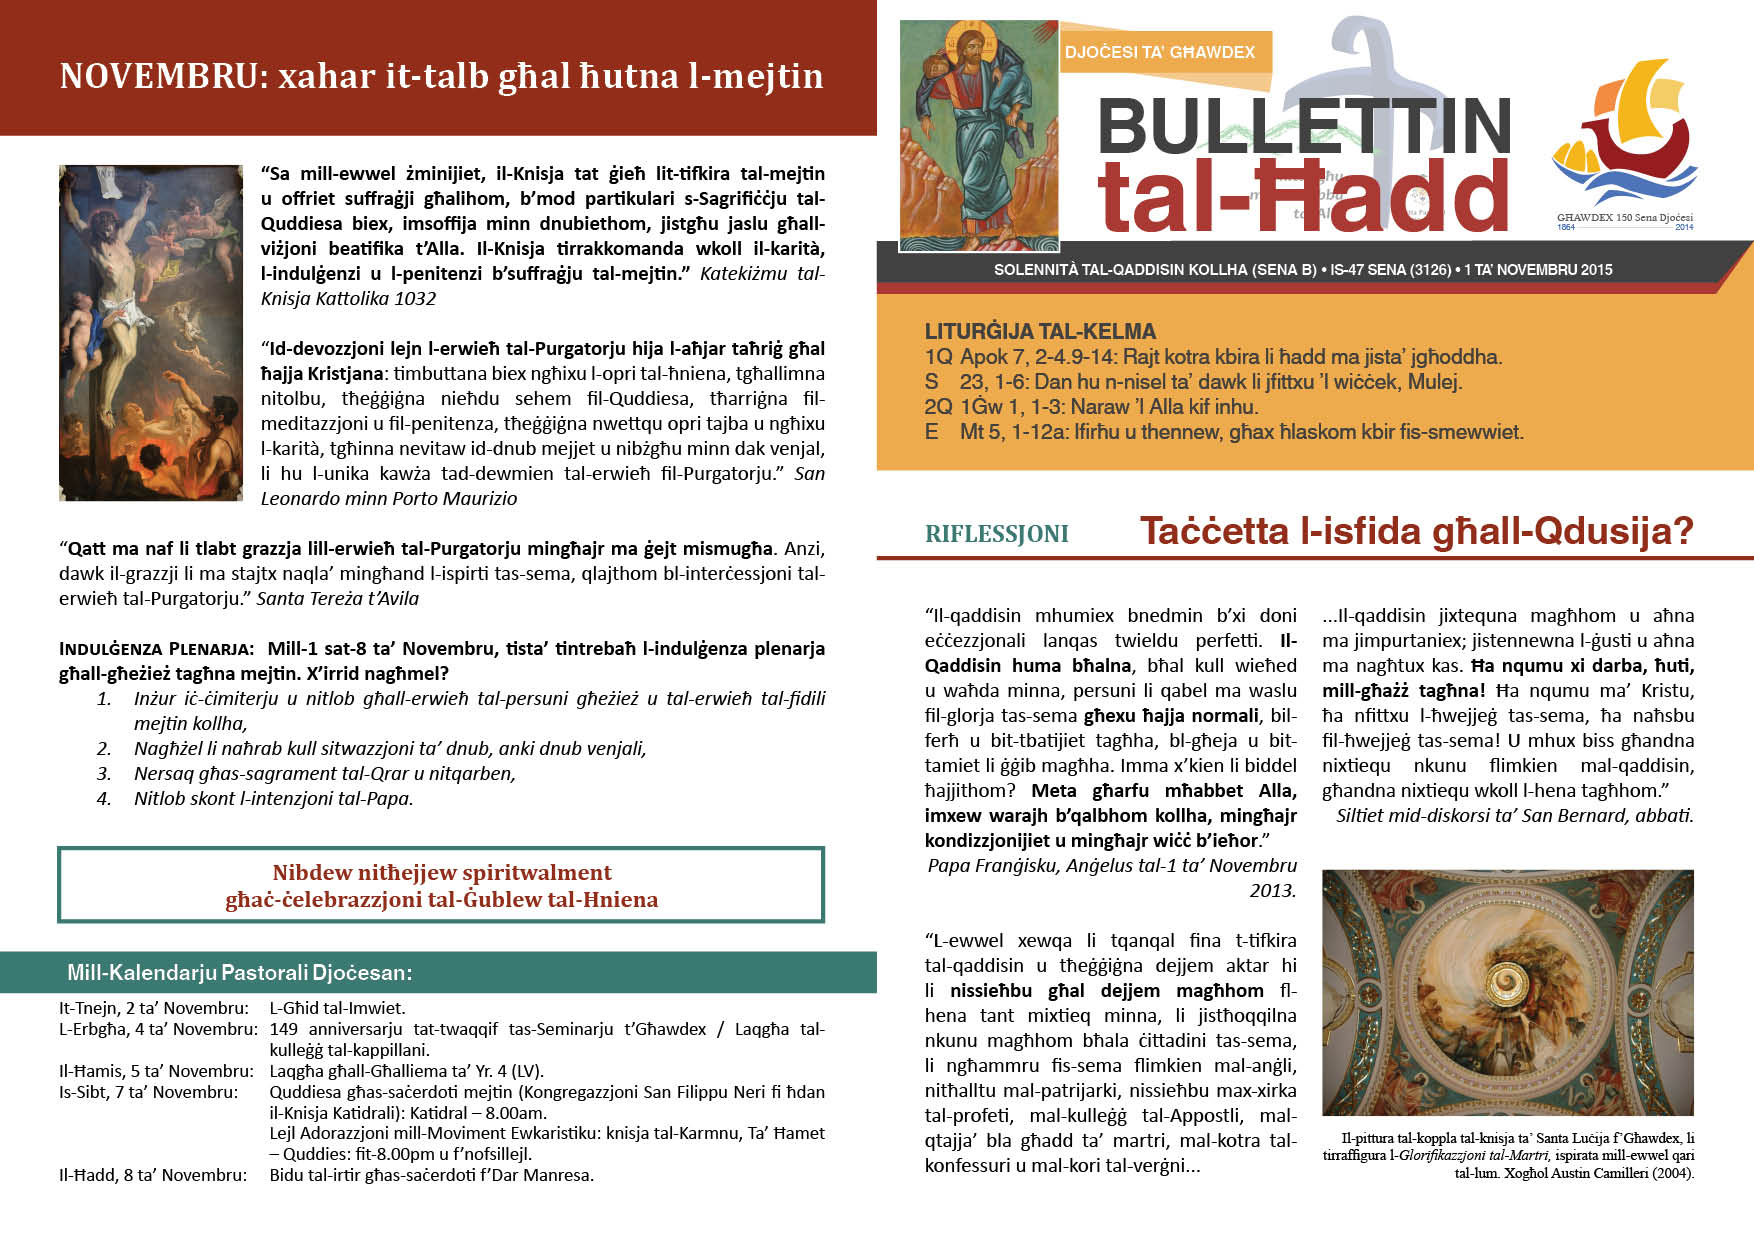 bullettin-2015-novembru-01.jpg